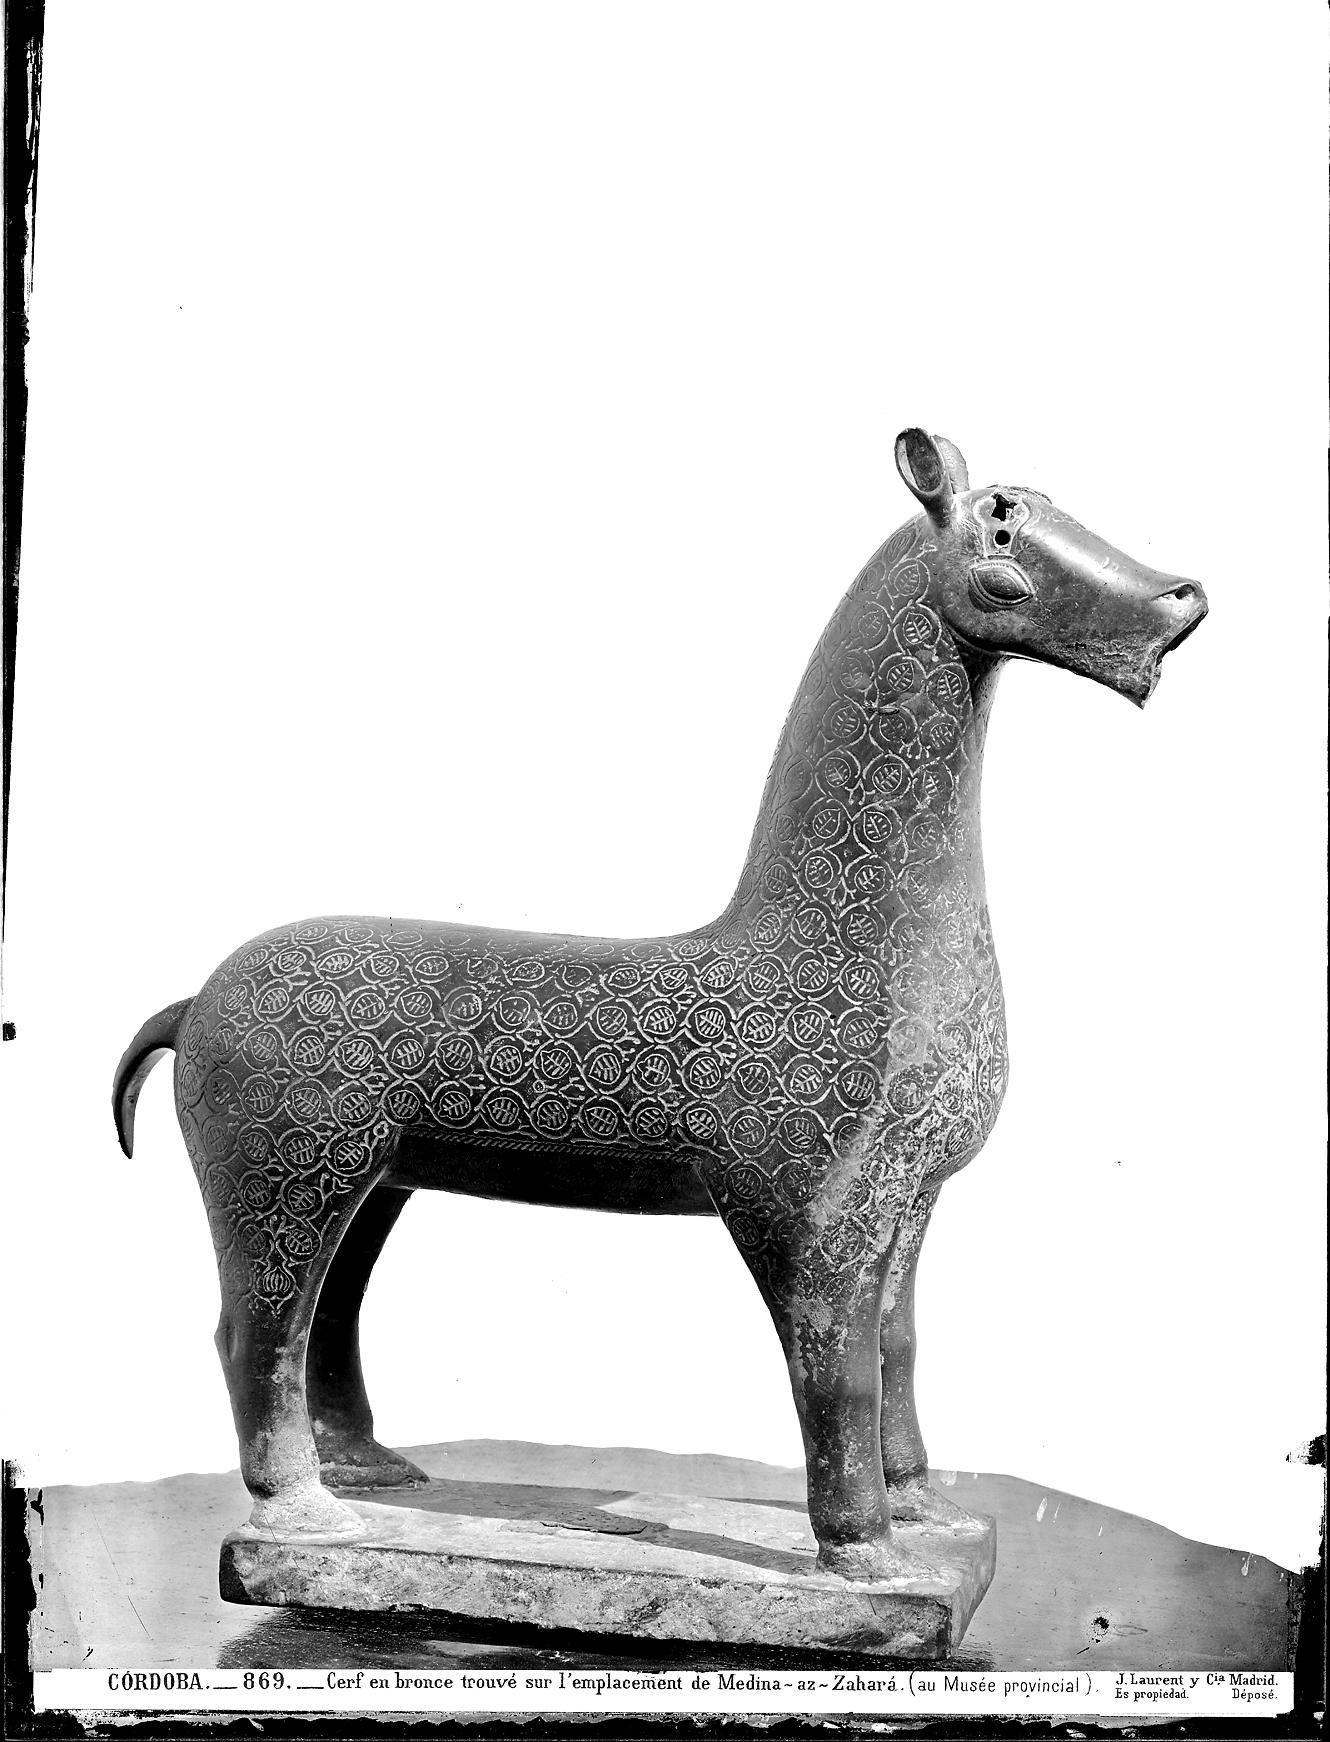 869 C�rdoba Cervatillo de bronce de Medina Azahara.jpg